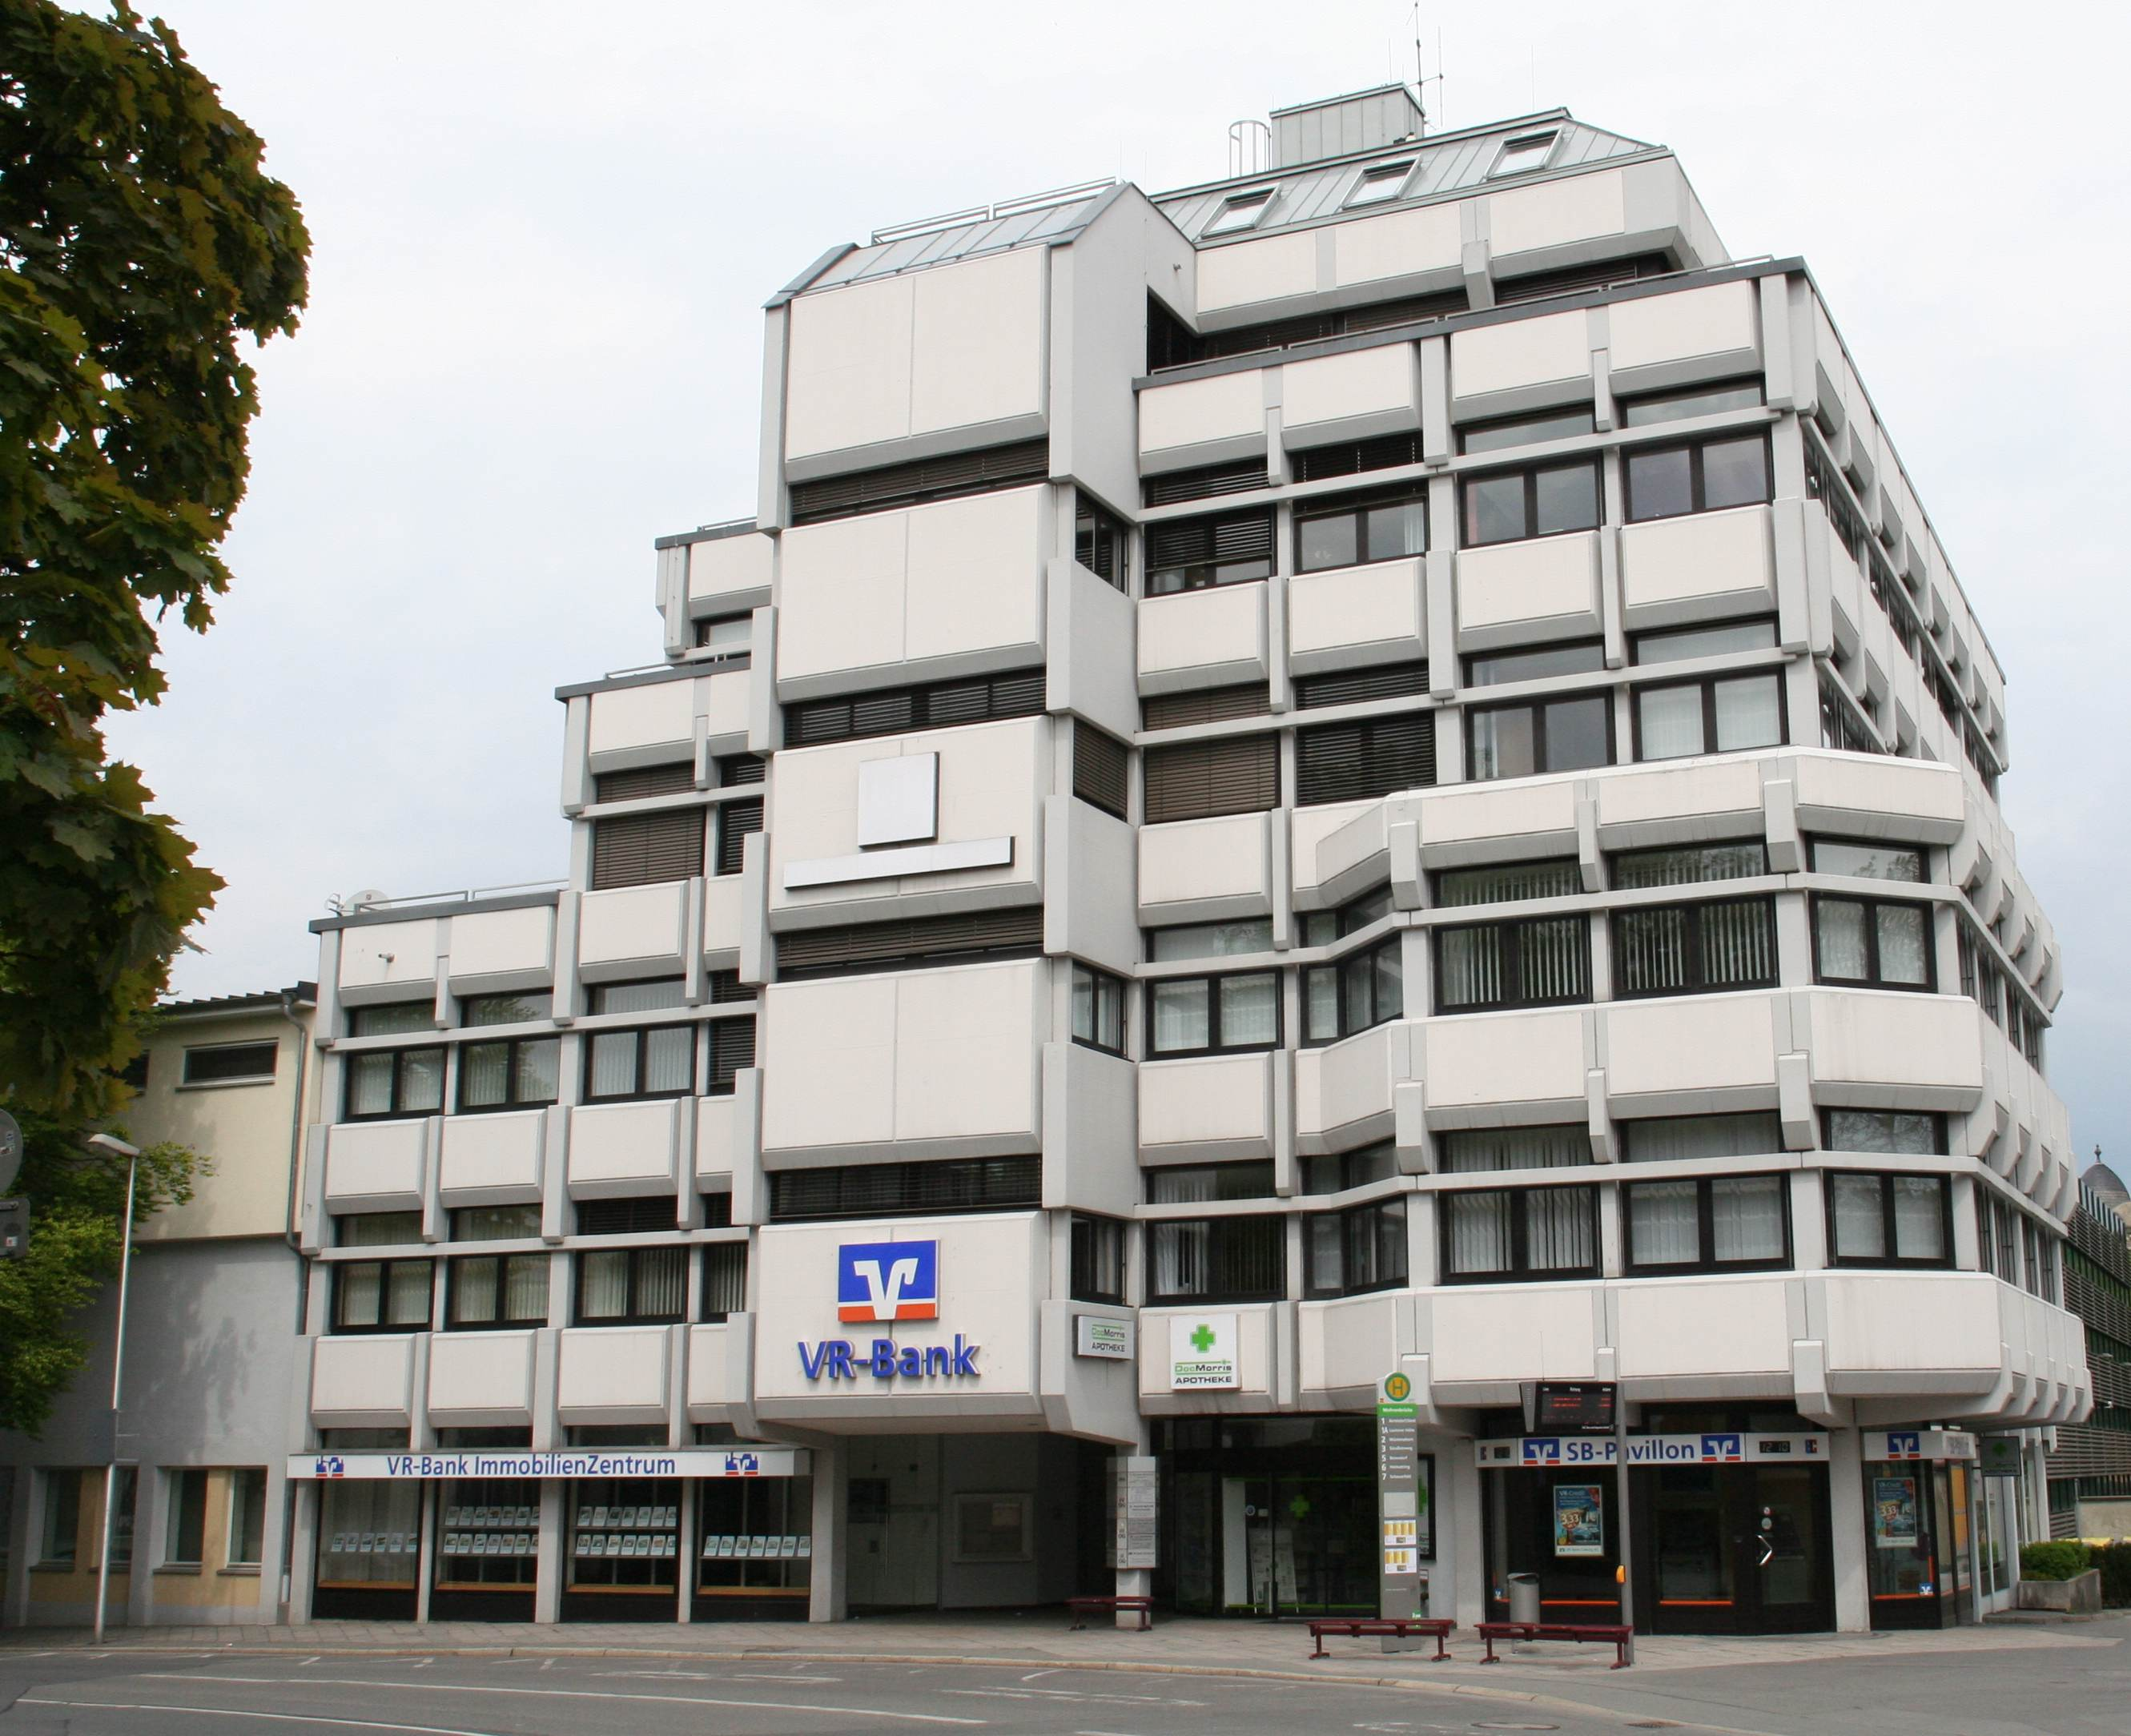 Vr-Bank Coburg